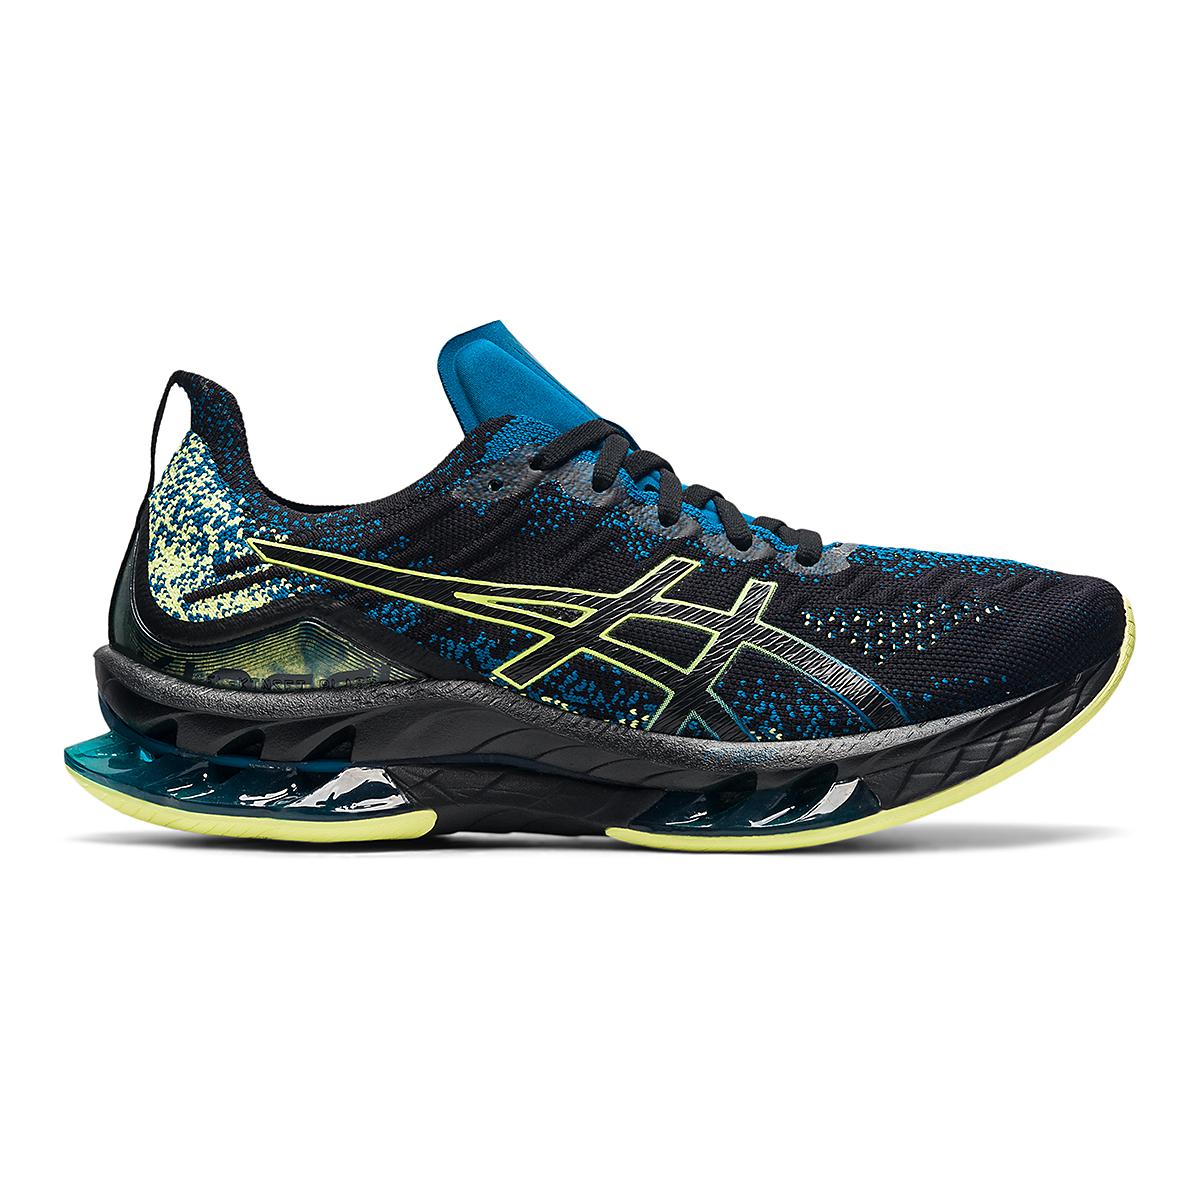 Men's Asics Kinsei Blast Running Shoe - Color: Black/Glow Yellow - Size: 6 - Width: Regular, Black/Glow Yellow, large, image 1